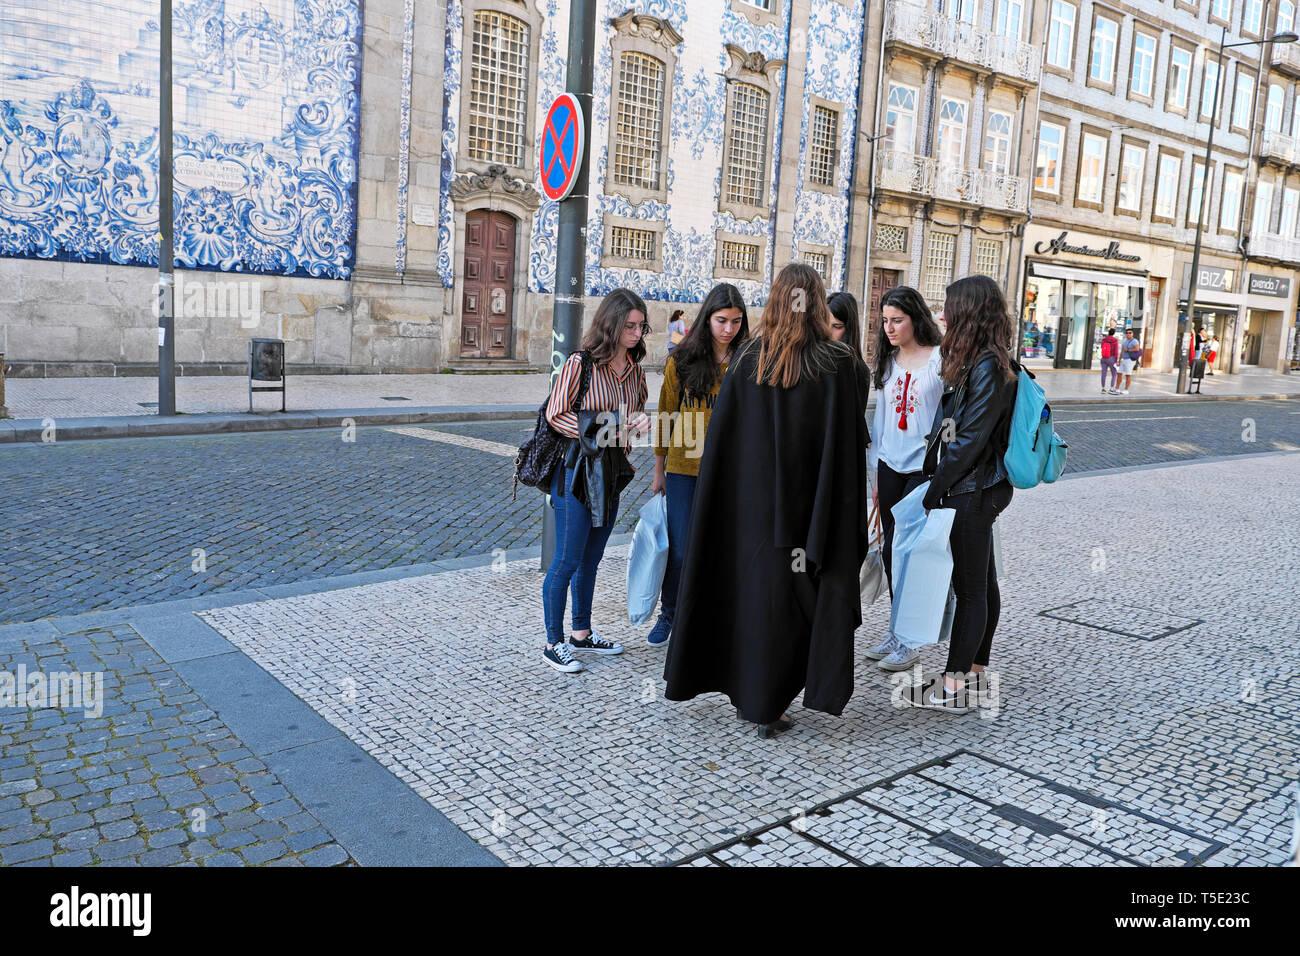 University female student in black cloak talking to friends in street Igreja do Carmo near Praça de Carlos Alberto Porto Portugal Europe KATHY DEWITT - Stock Image